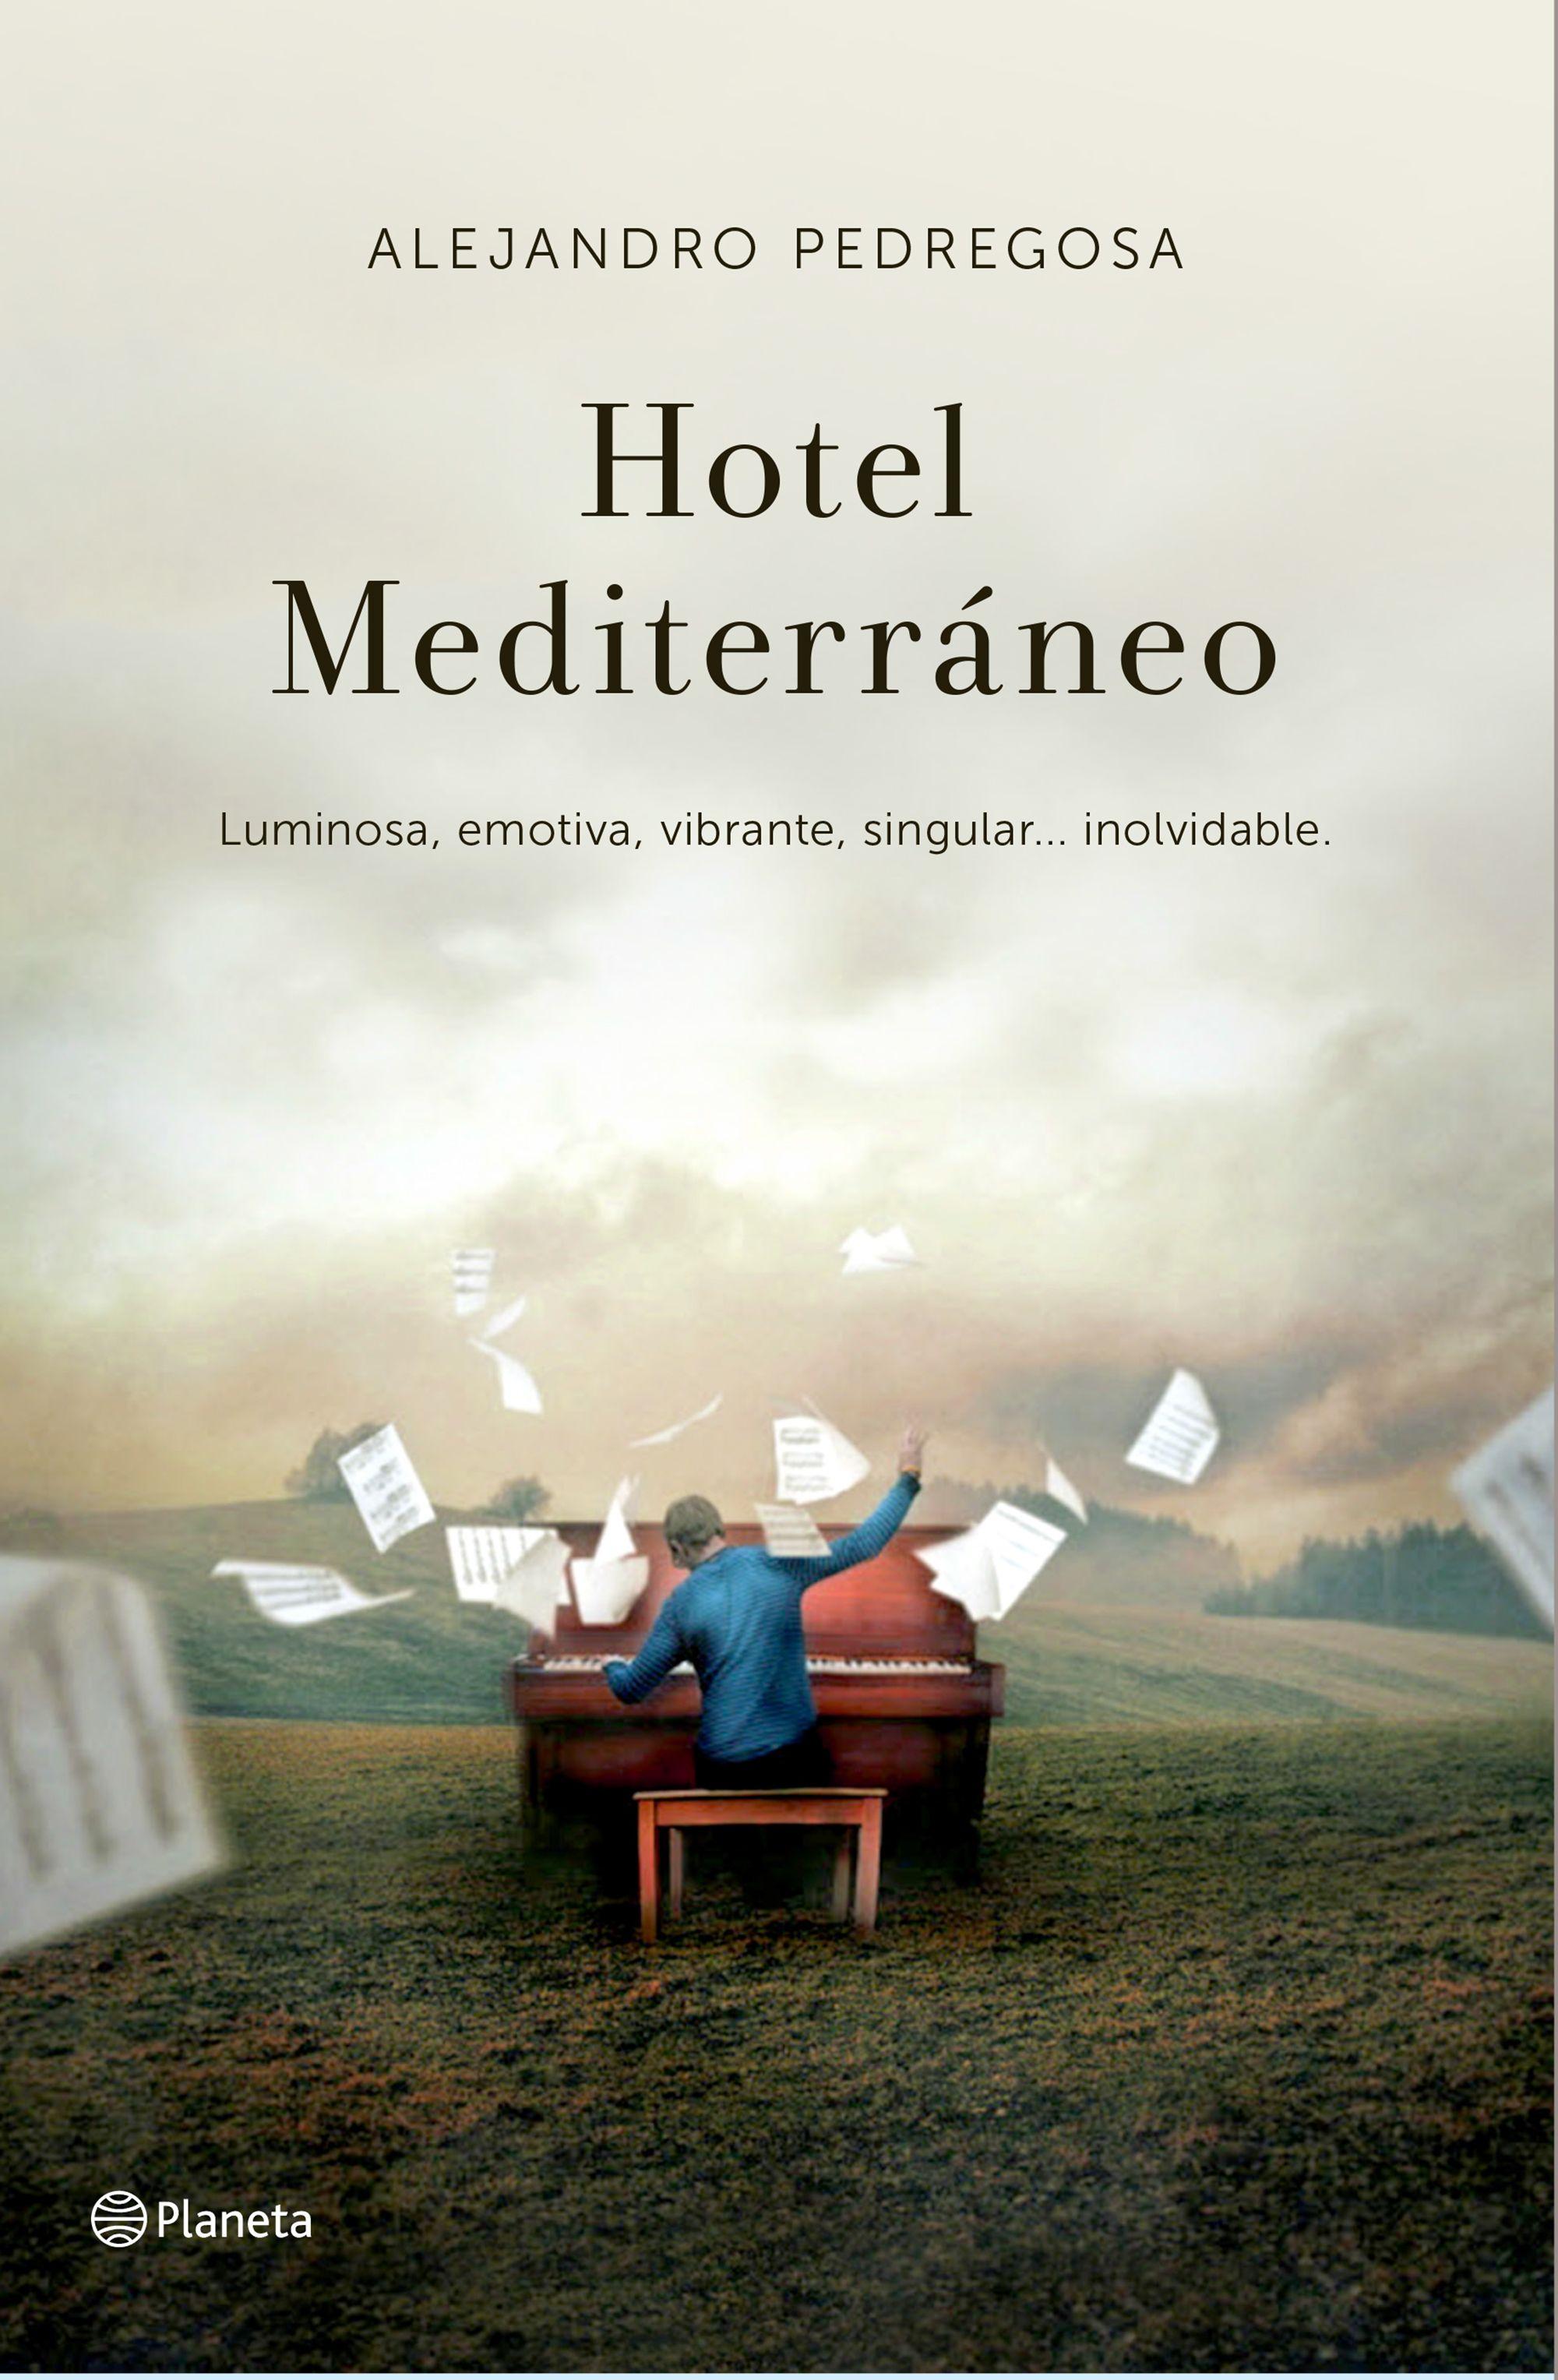 Hotel mediterráneo, Alejandro Pedregosa, Planeta